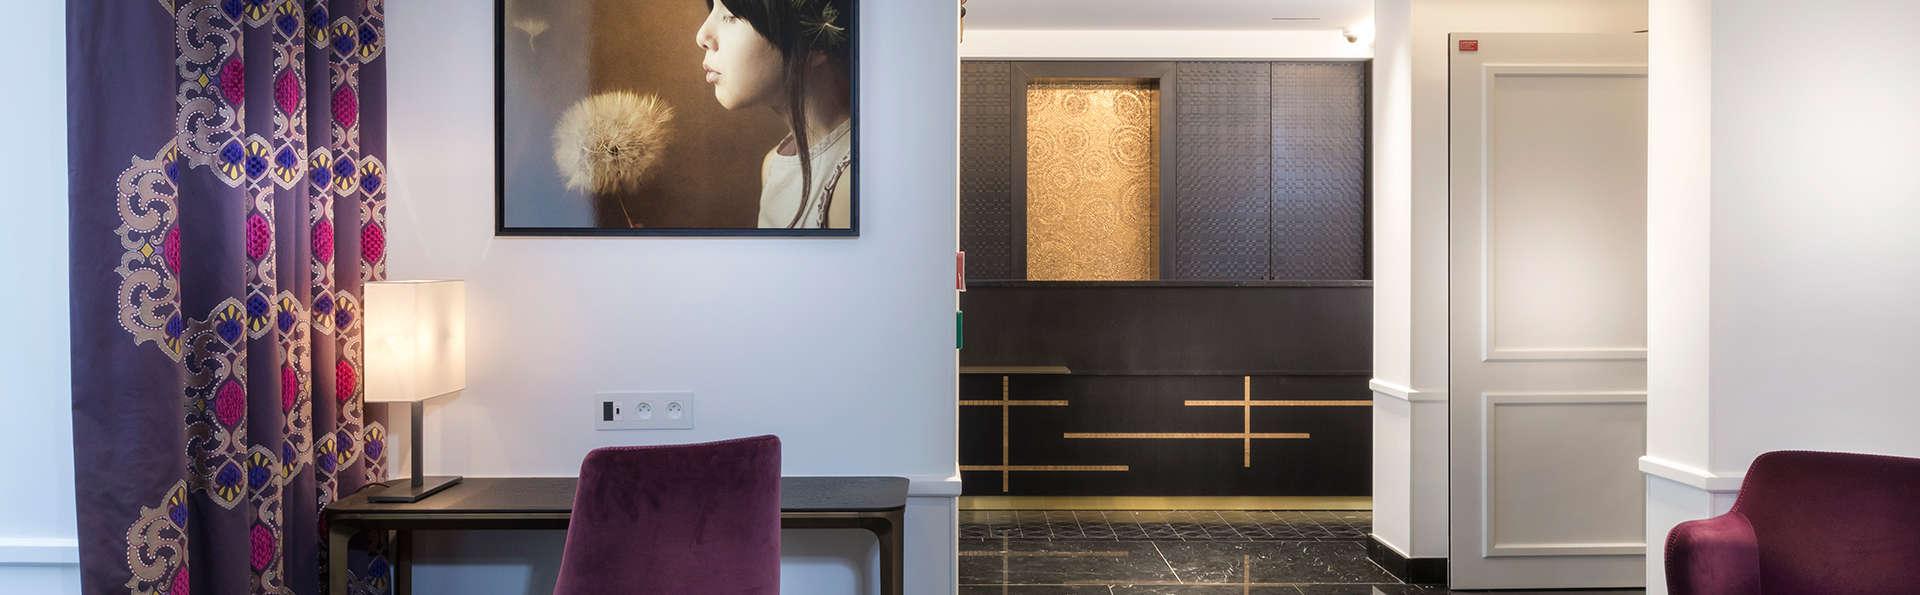 Hôtel Vendôme Opéra - Edit_Lobby.jpg